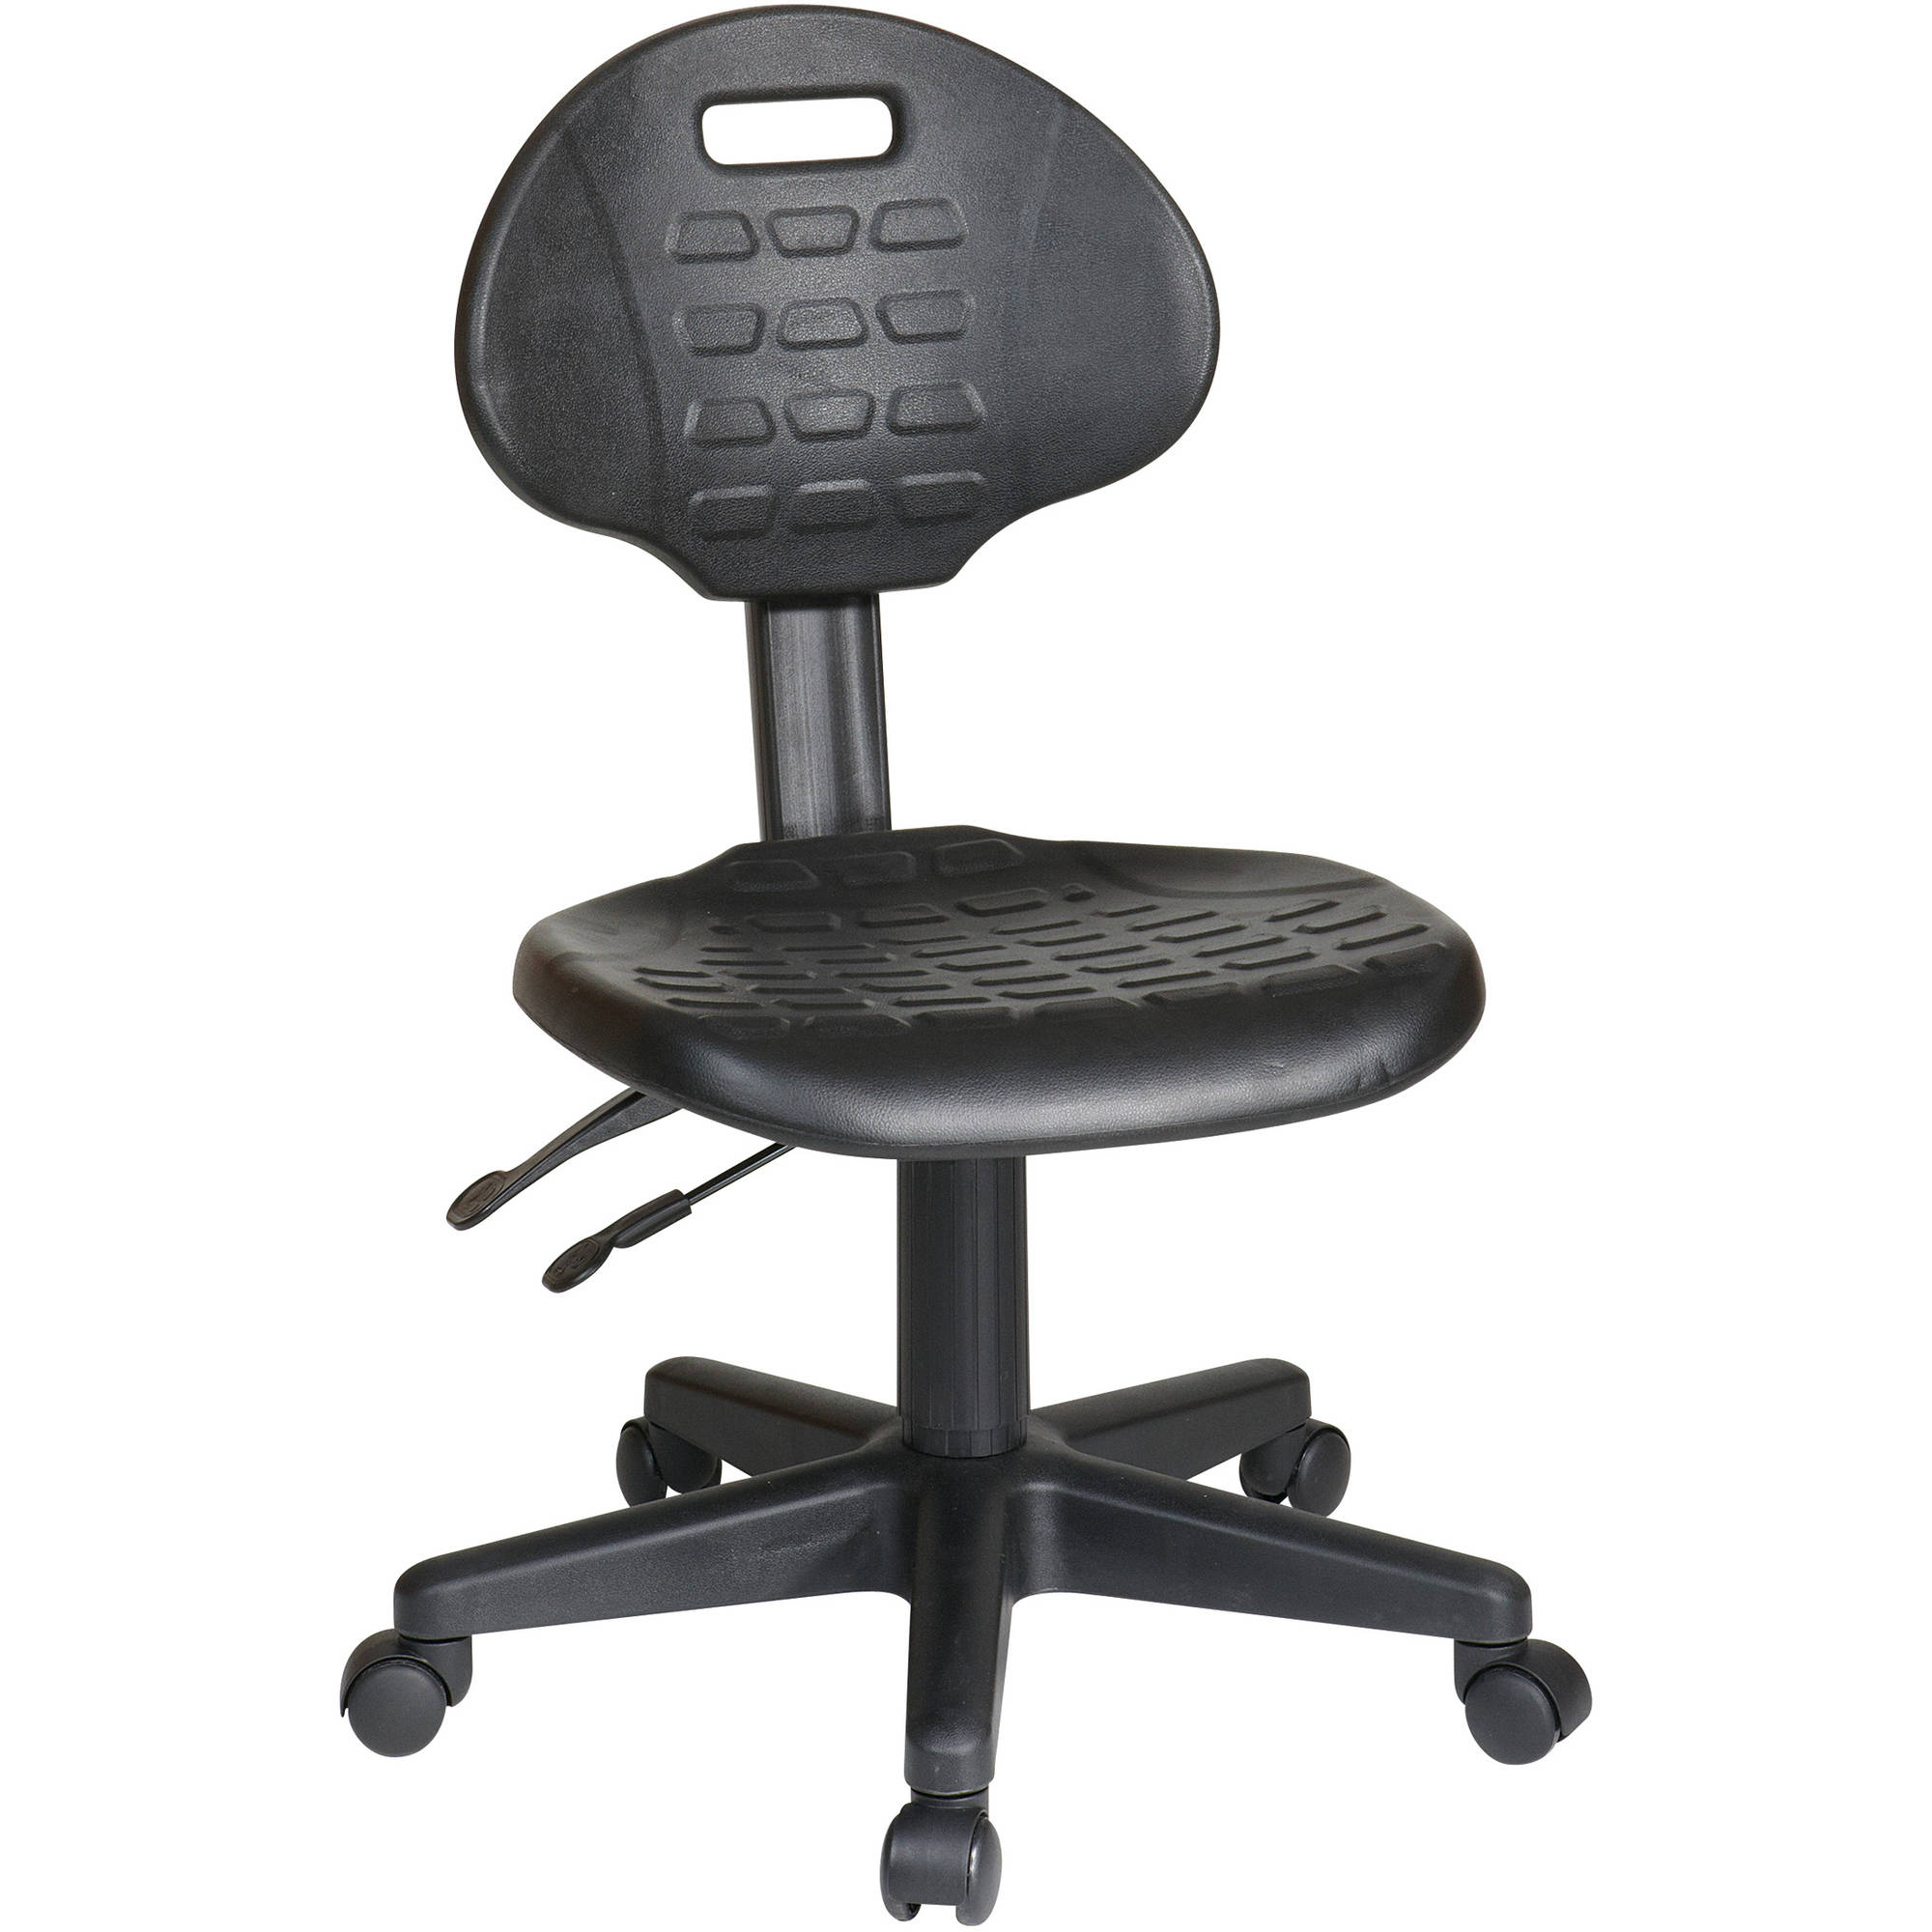 Work Smart Ergonomic Chair with Seat Tilt and Back Angle Adjustment, Black